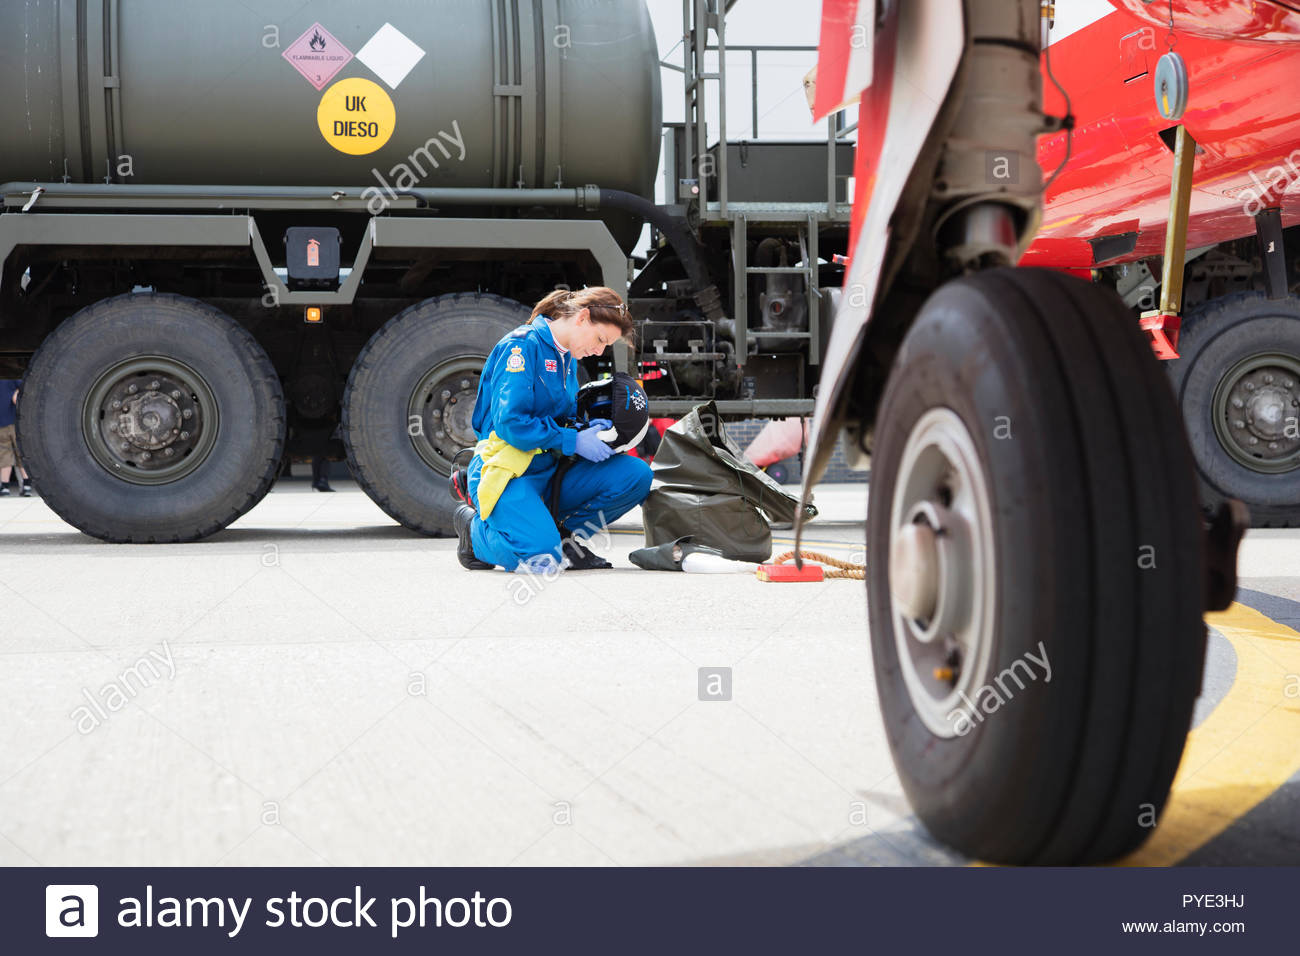 Crouched Red Arrows pilot holding helmet on RAF Scrampton, UK Stock Photo